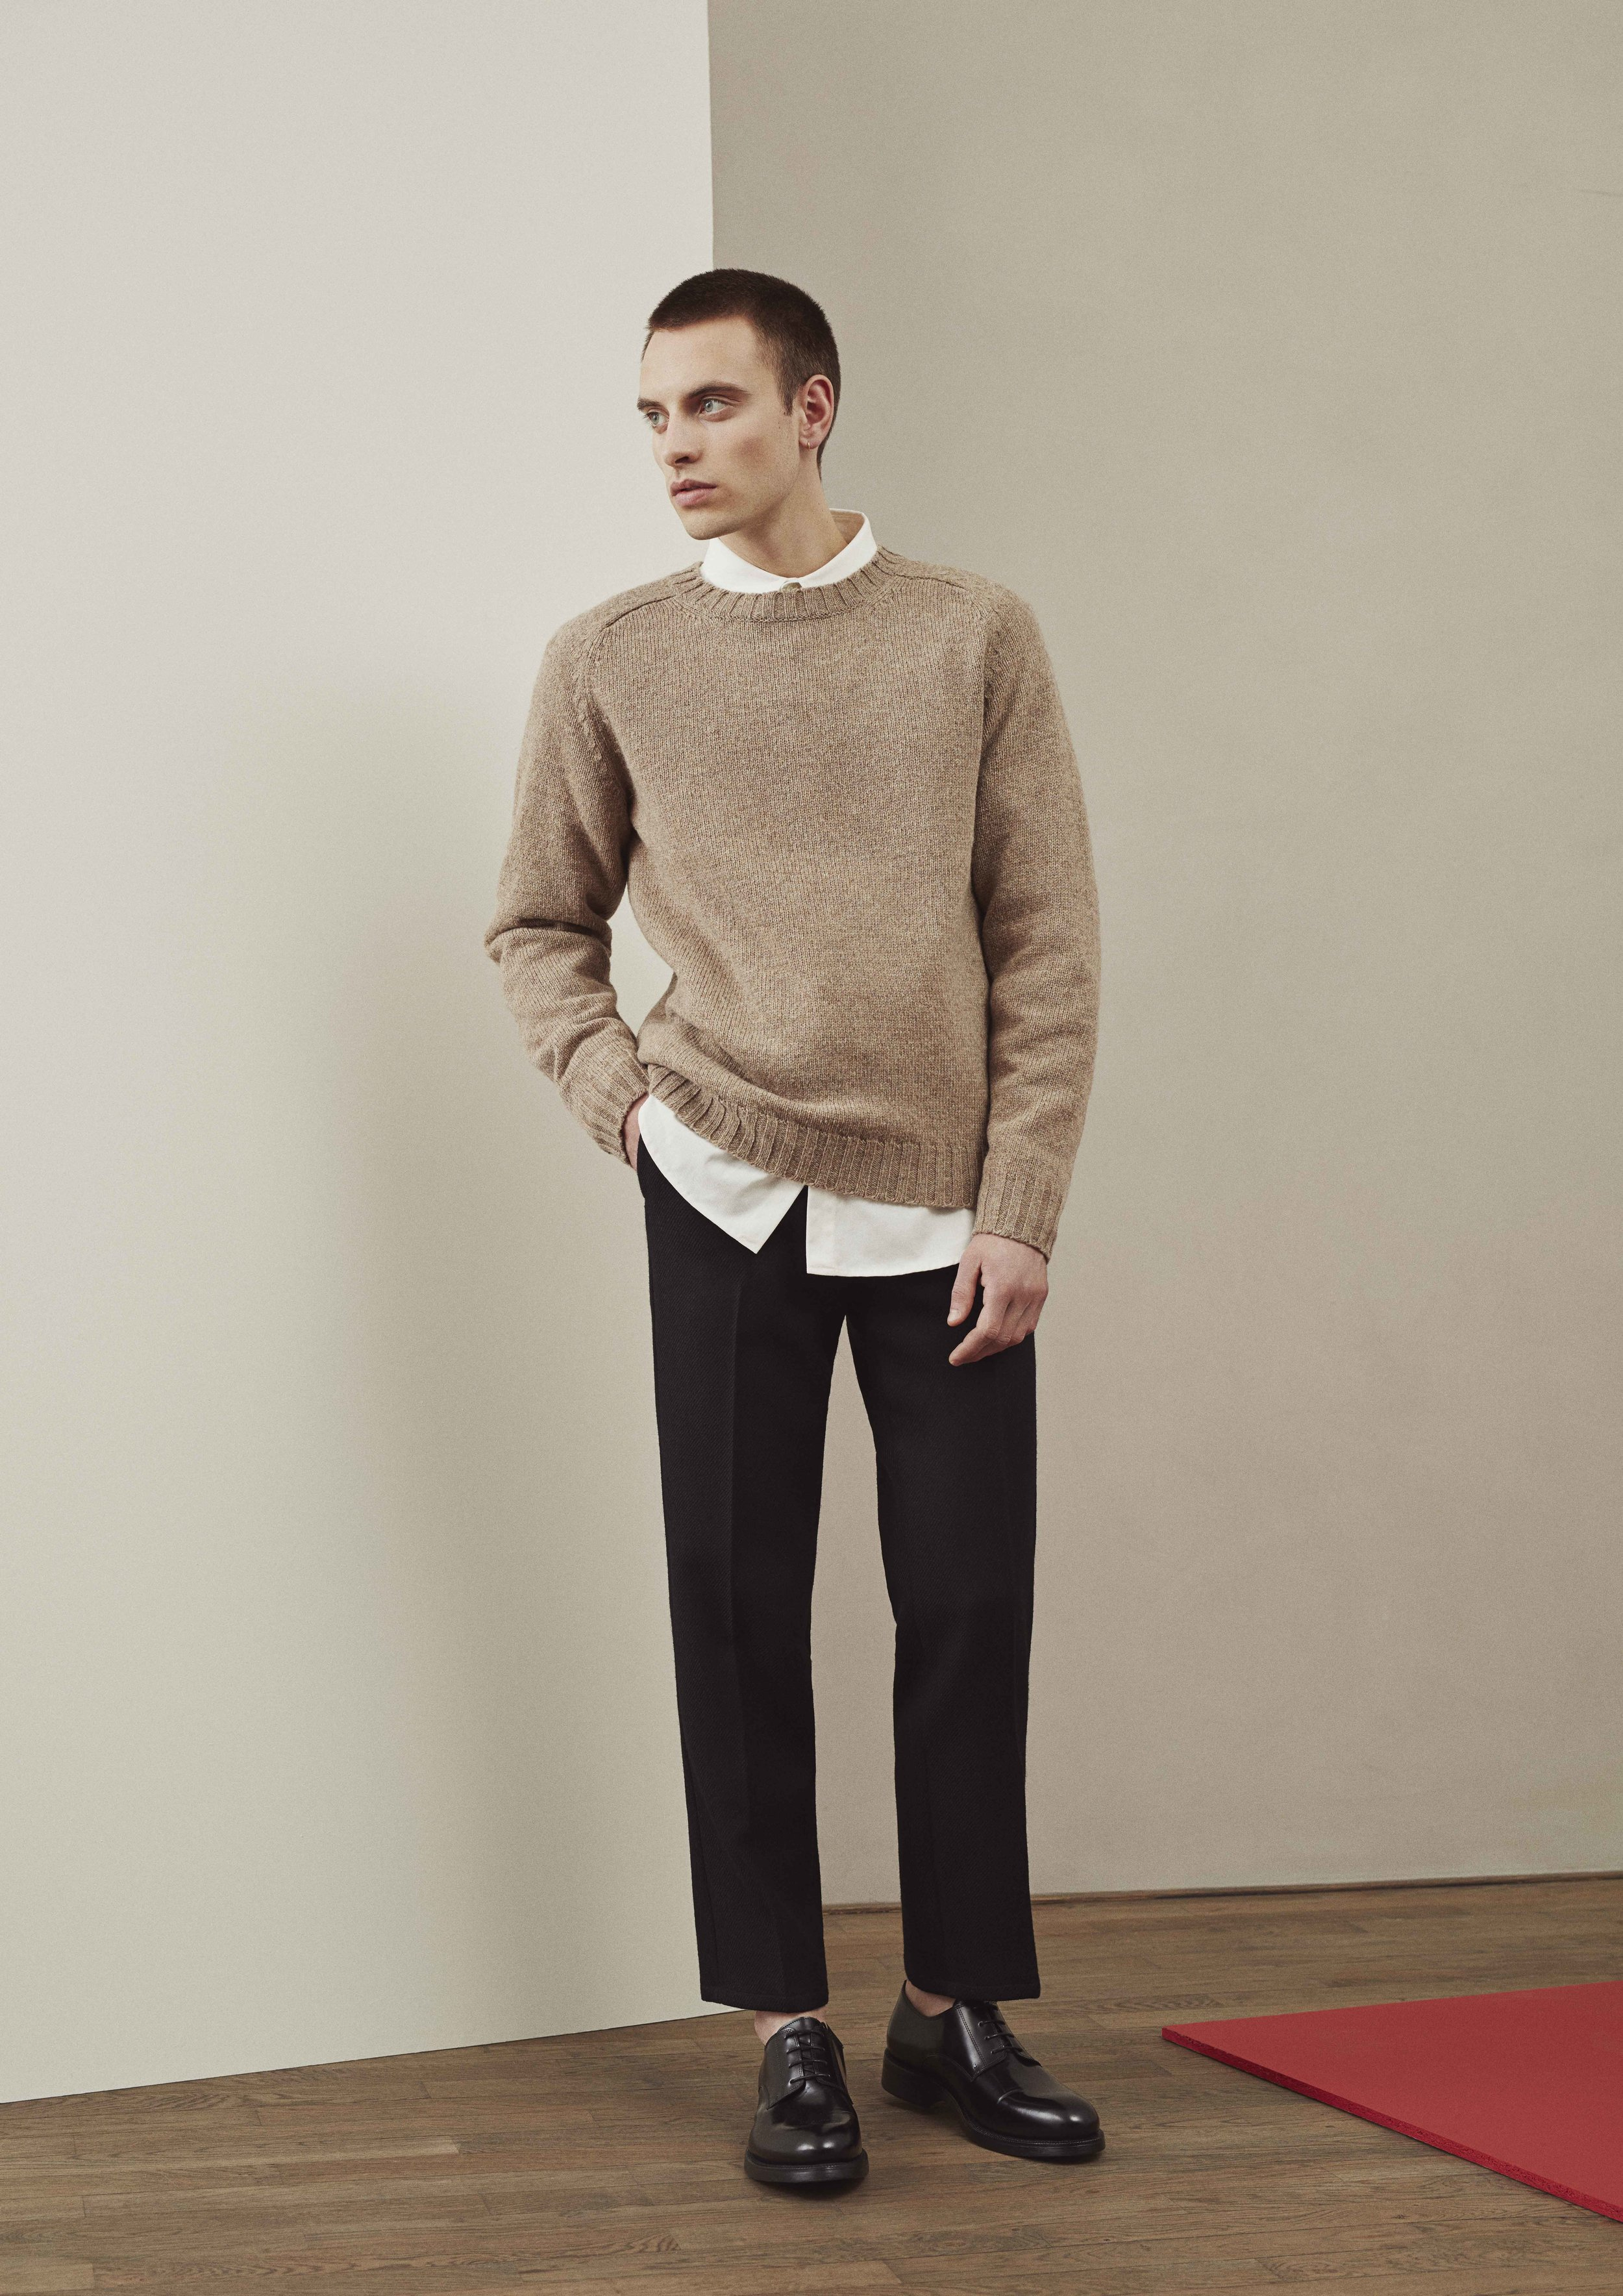 <b>8</b><br>Nias Shetland Wool Jumper<br>Victor Cotton Shirt<br>Felix Highland Wool Pants